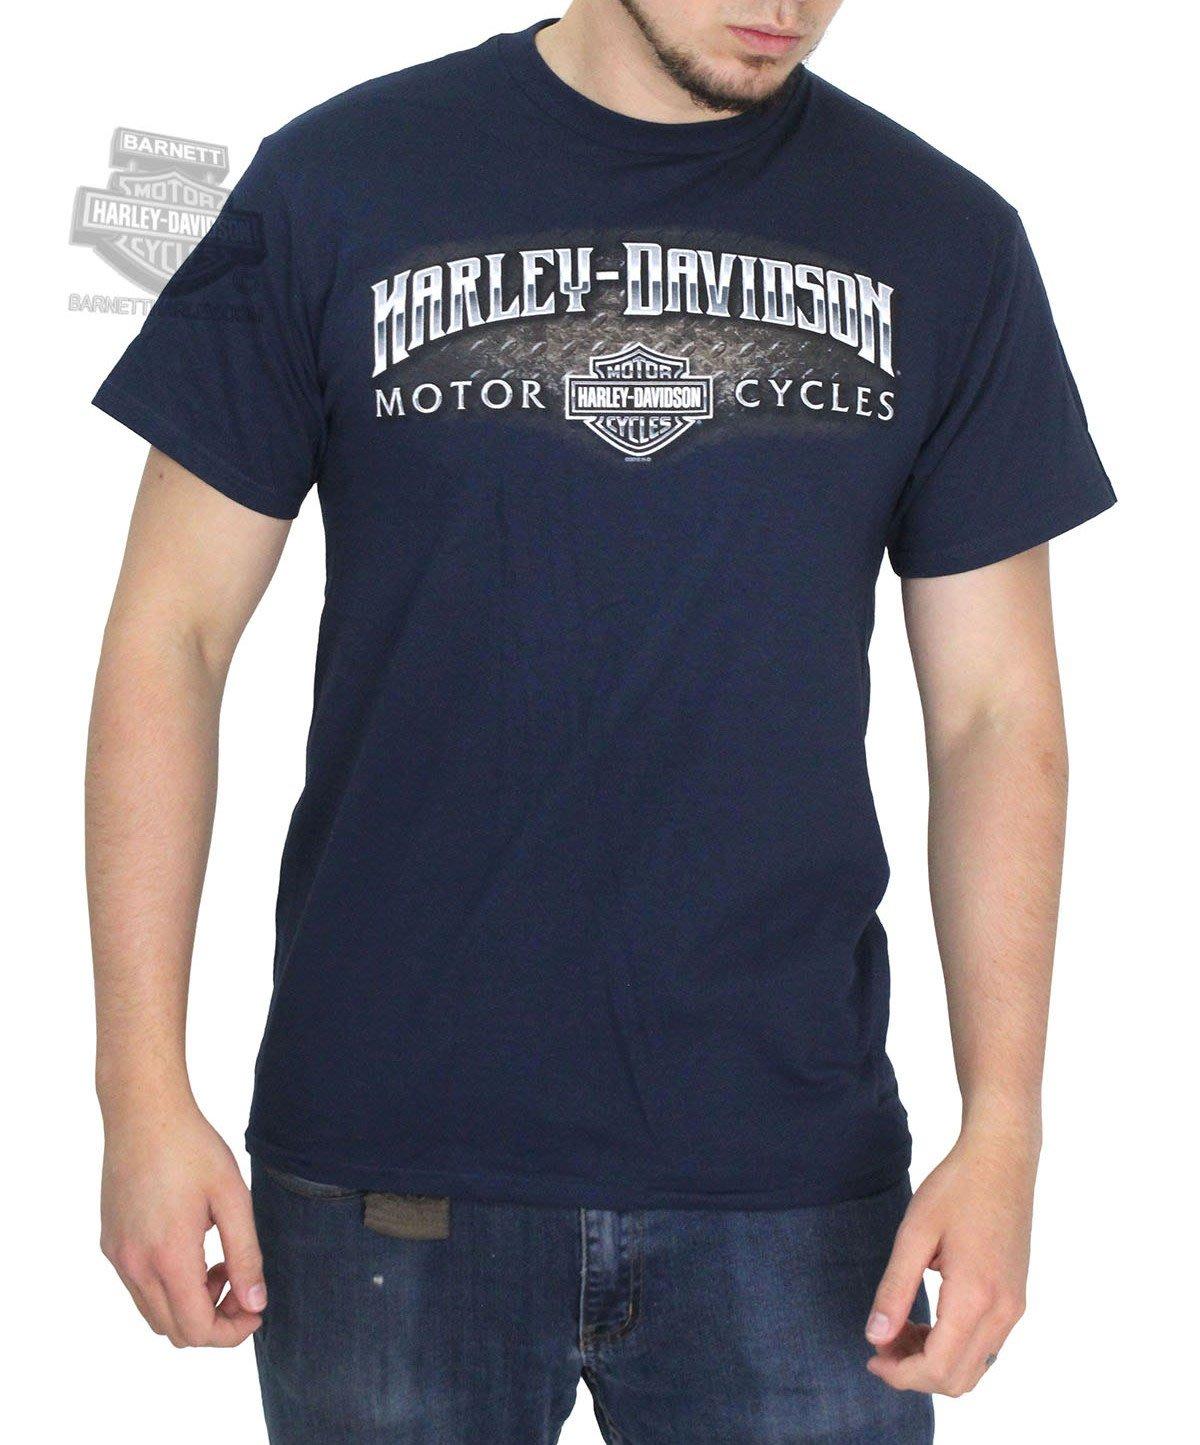 Harley-Davidson 哈雷機車 短袖T 海軍藍 S 全新 現貨 Enraged Clutch